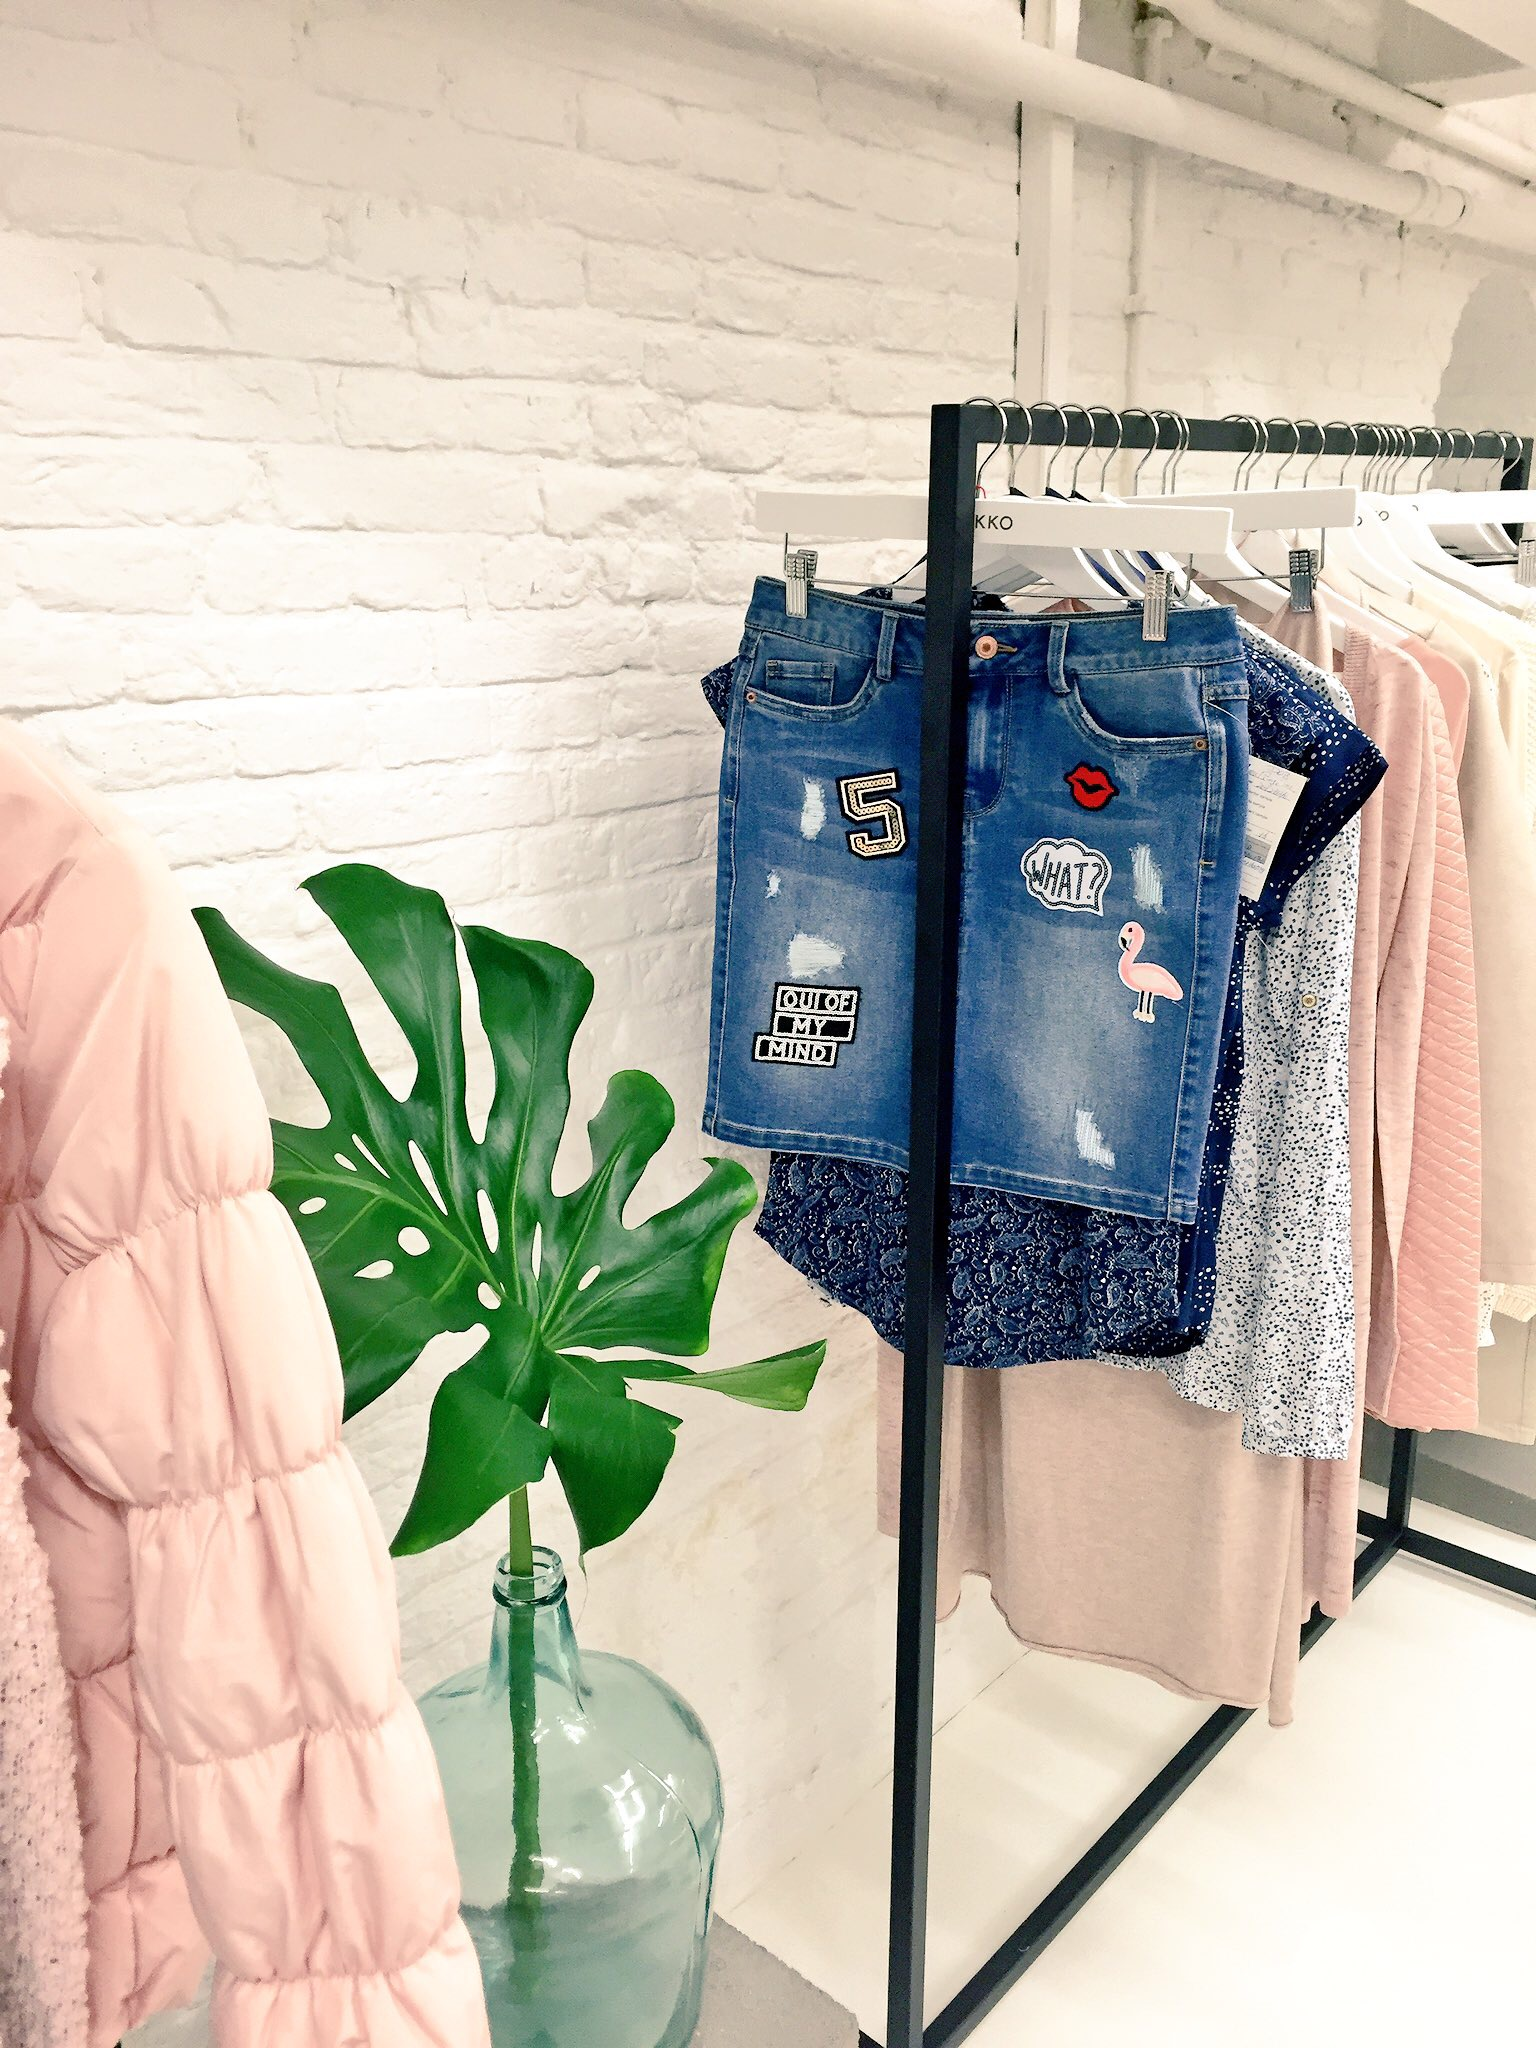 Fashion   Zó scoor je je kledingstuk voor de beste prijs